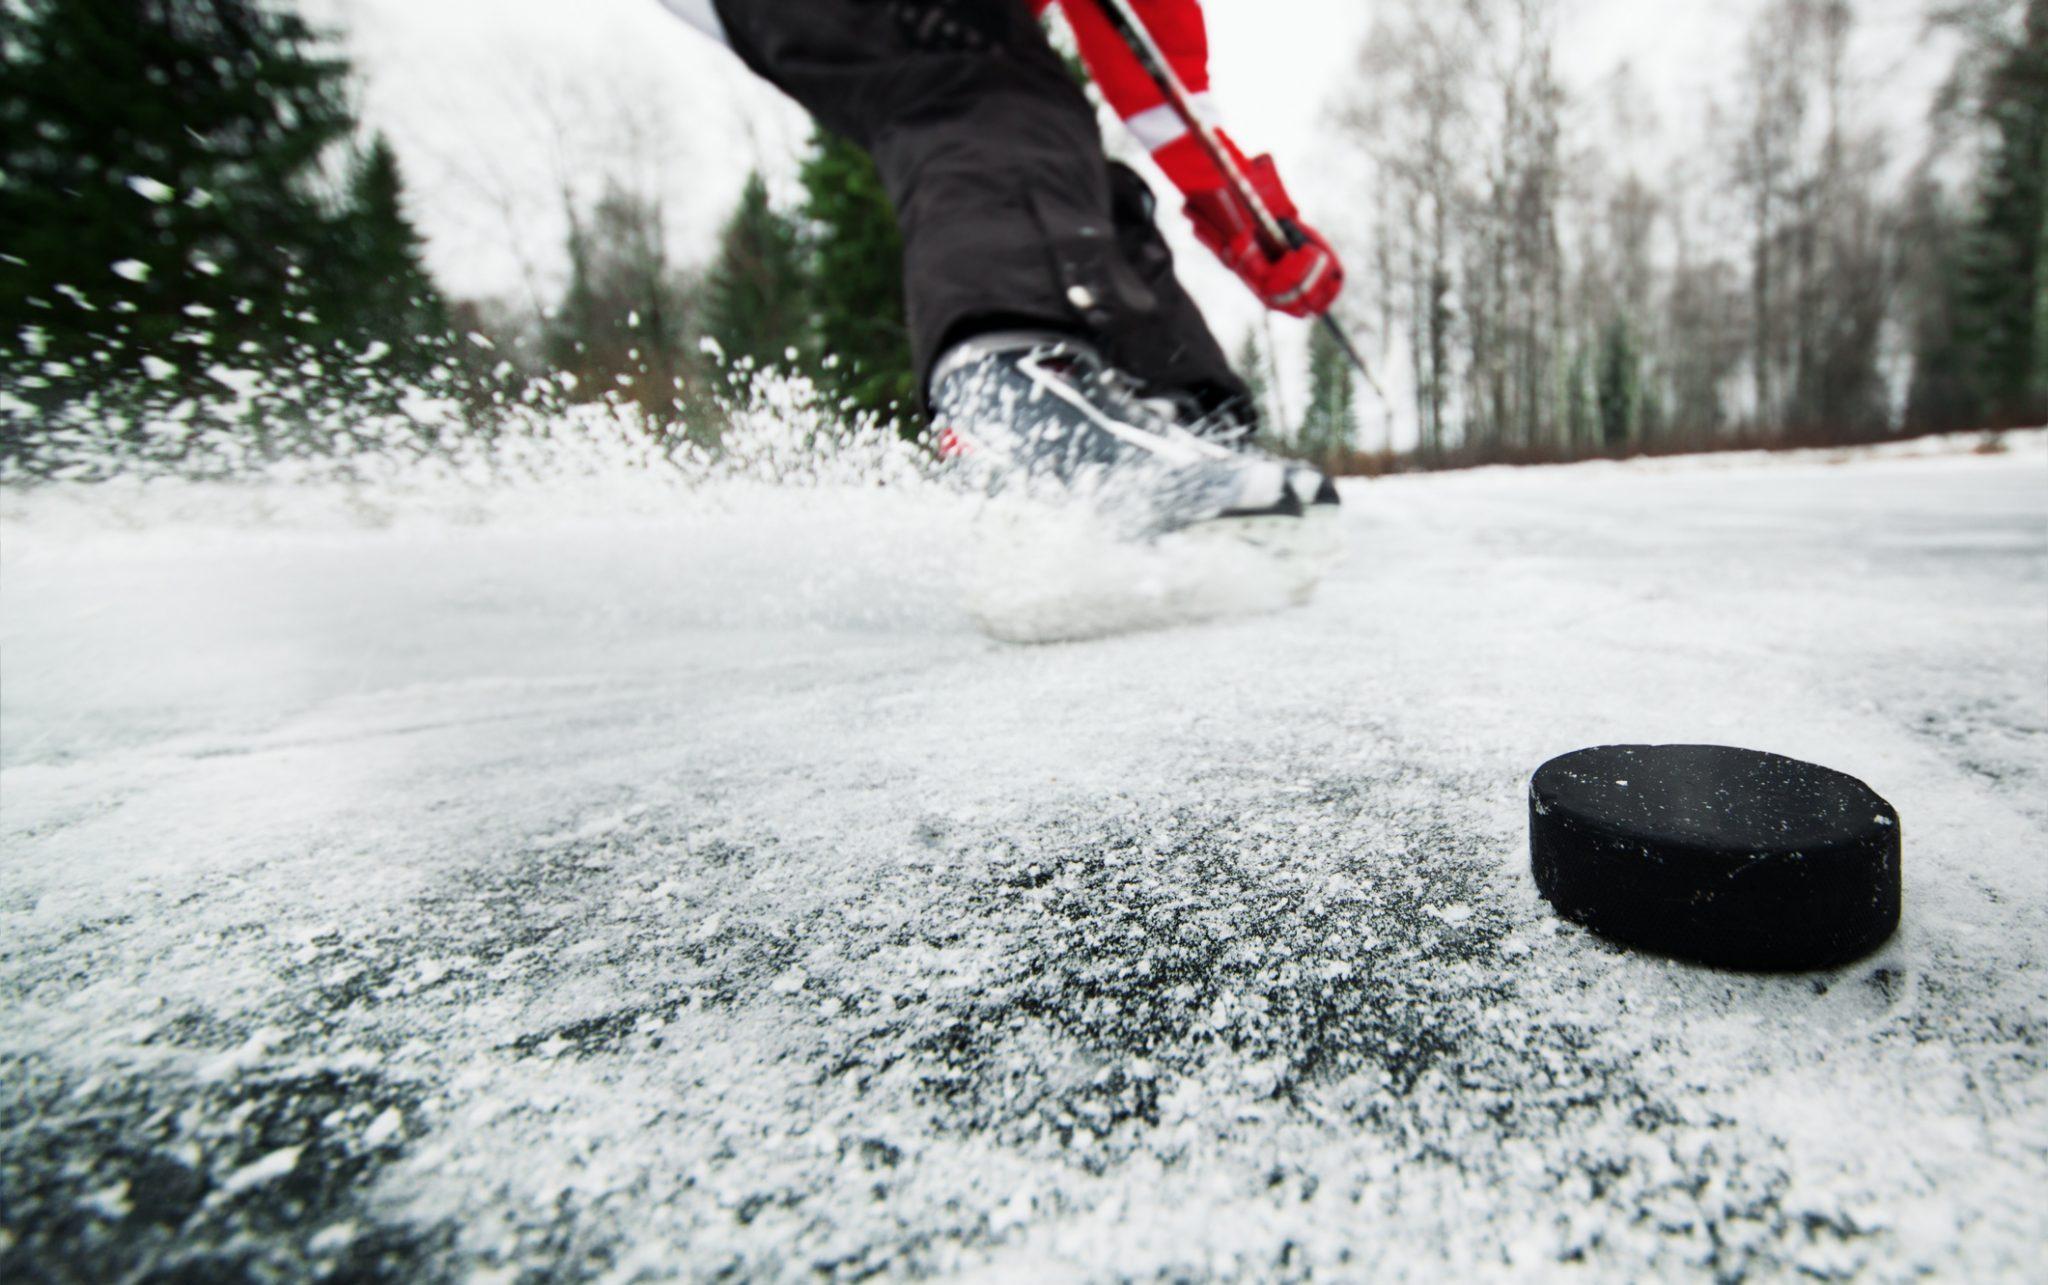 endurance athletes pandemic hockey puck and stick